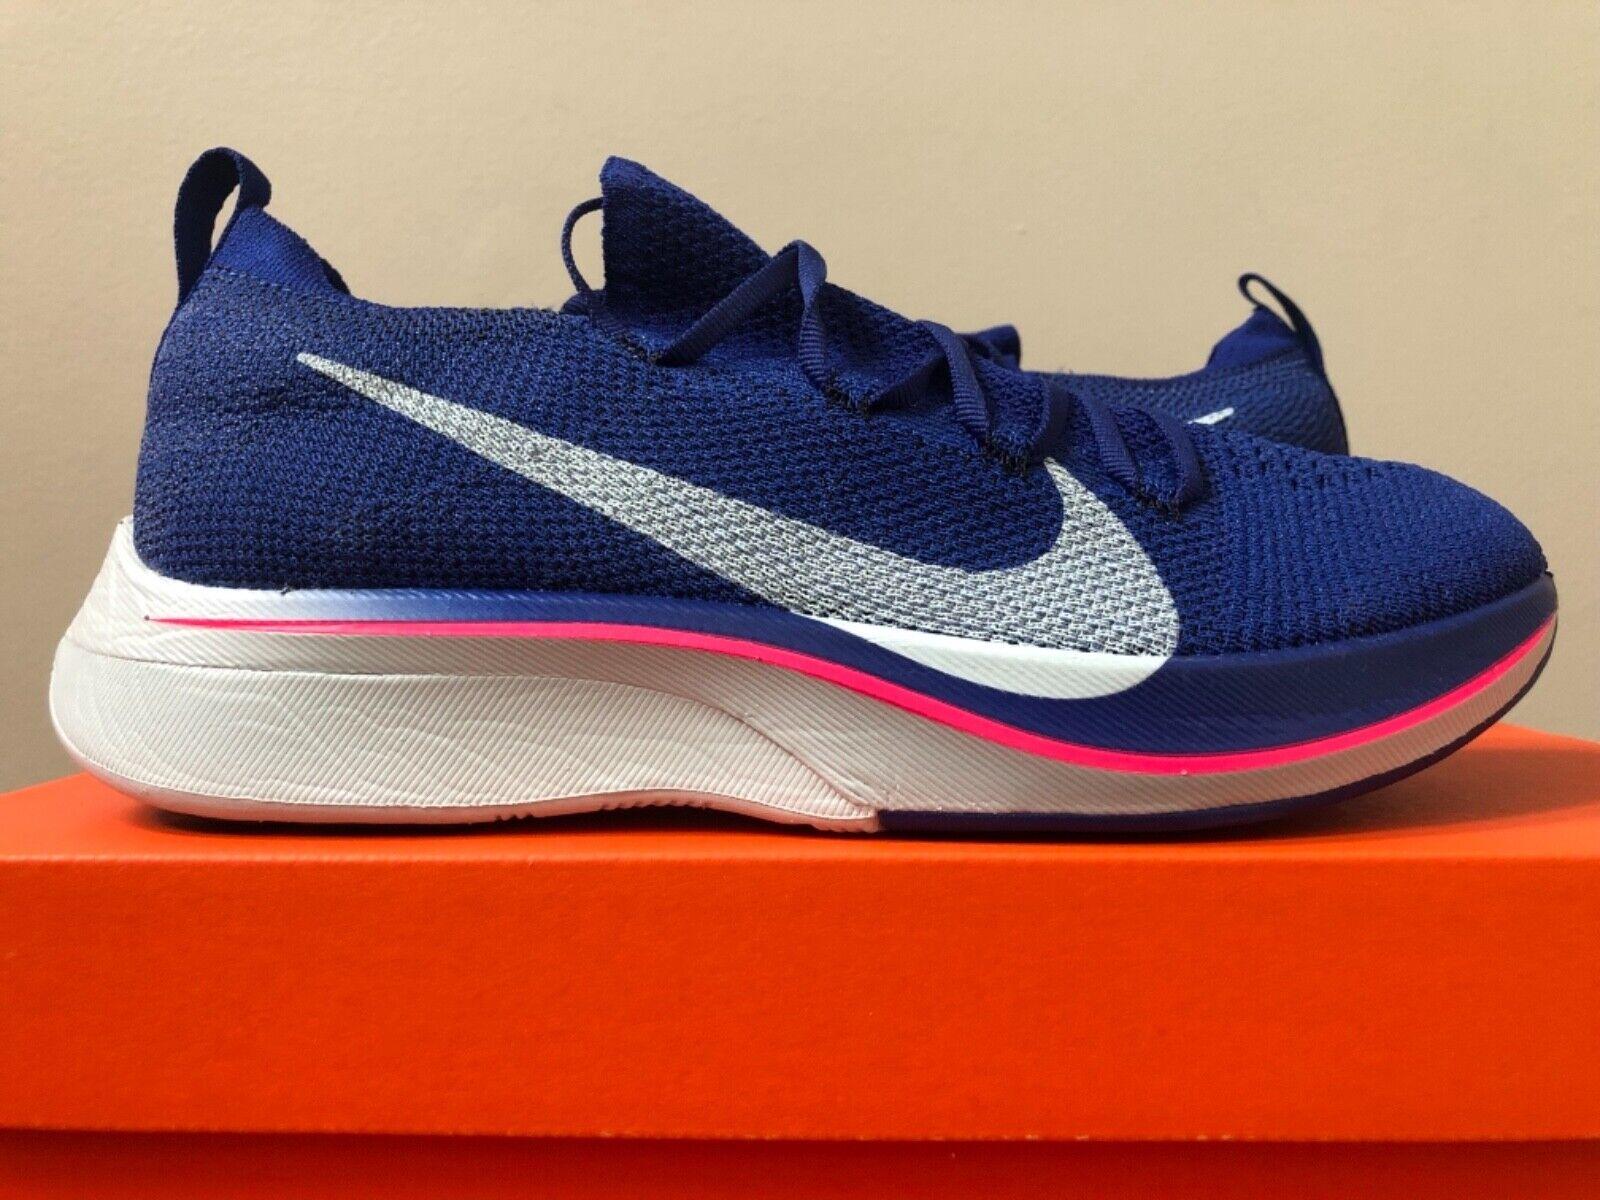 dbe57838d6cc9 Nike Vaporfly 4% Flyknit Deep Royal Blue Size 6.5-13 AJ3857-400 100%  Authentic